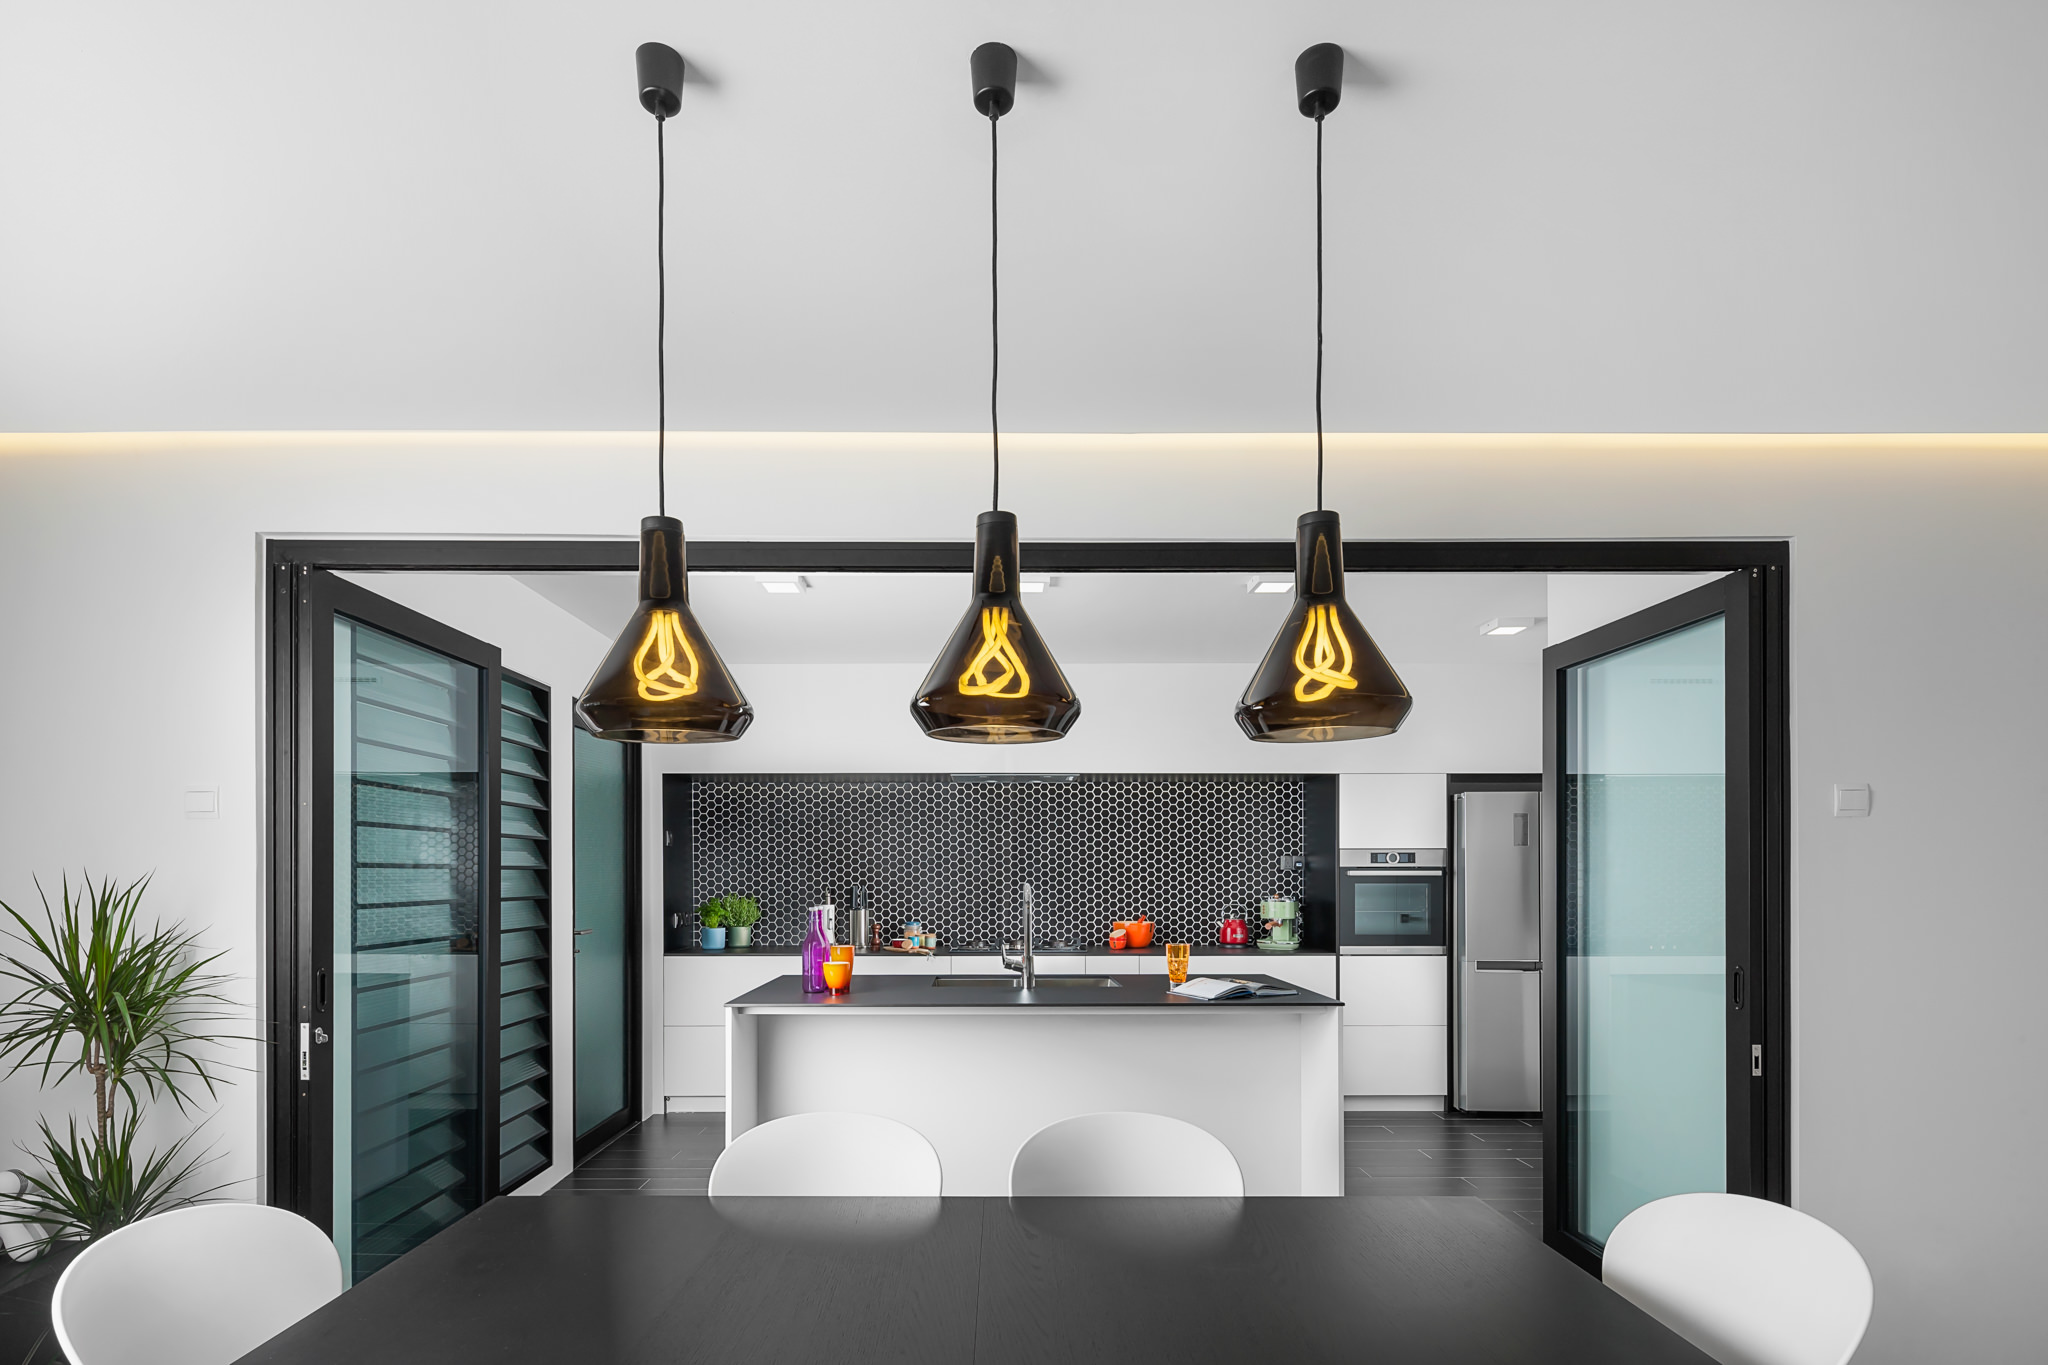 interior photographer singapore architectural photography